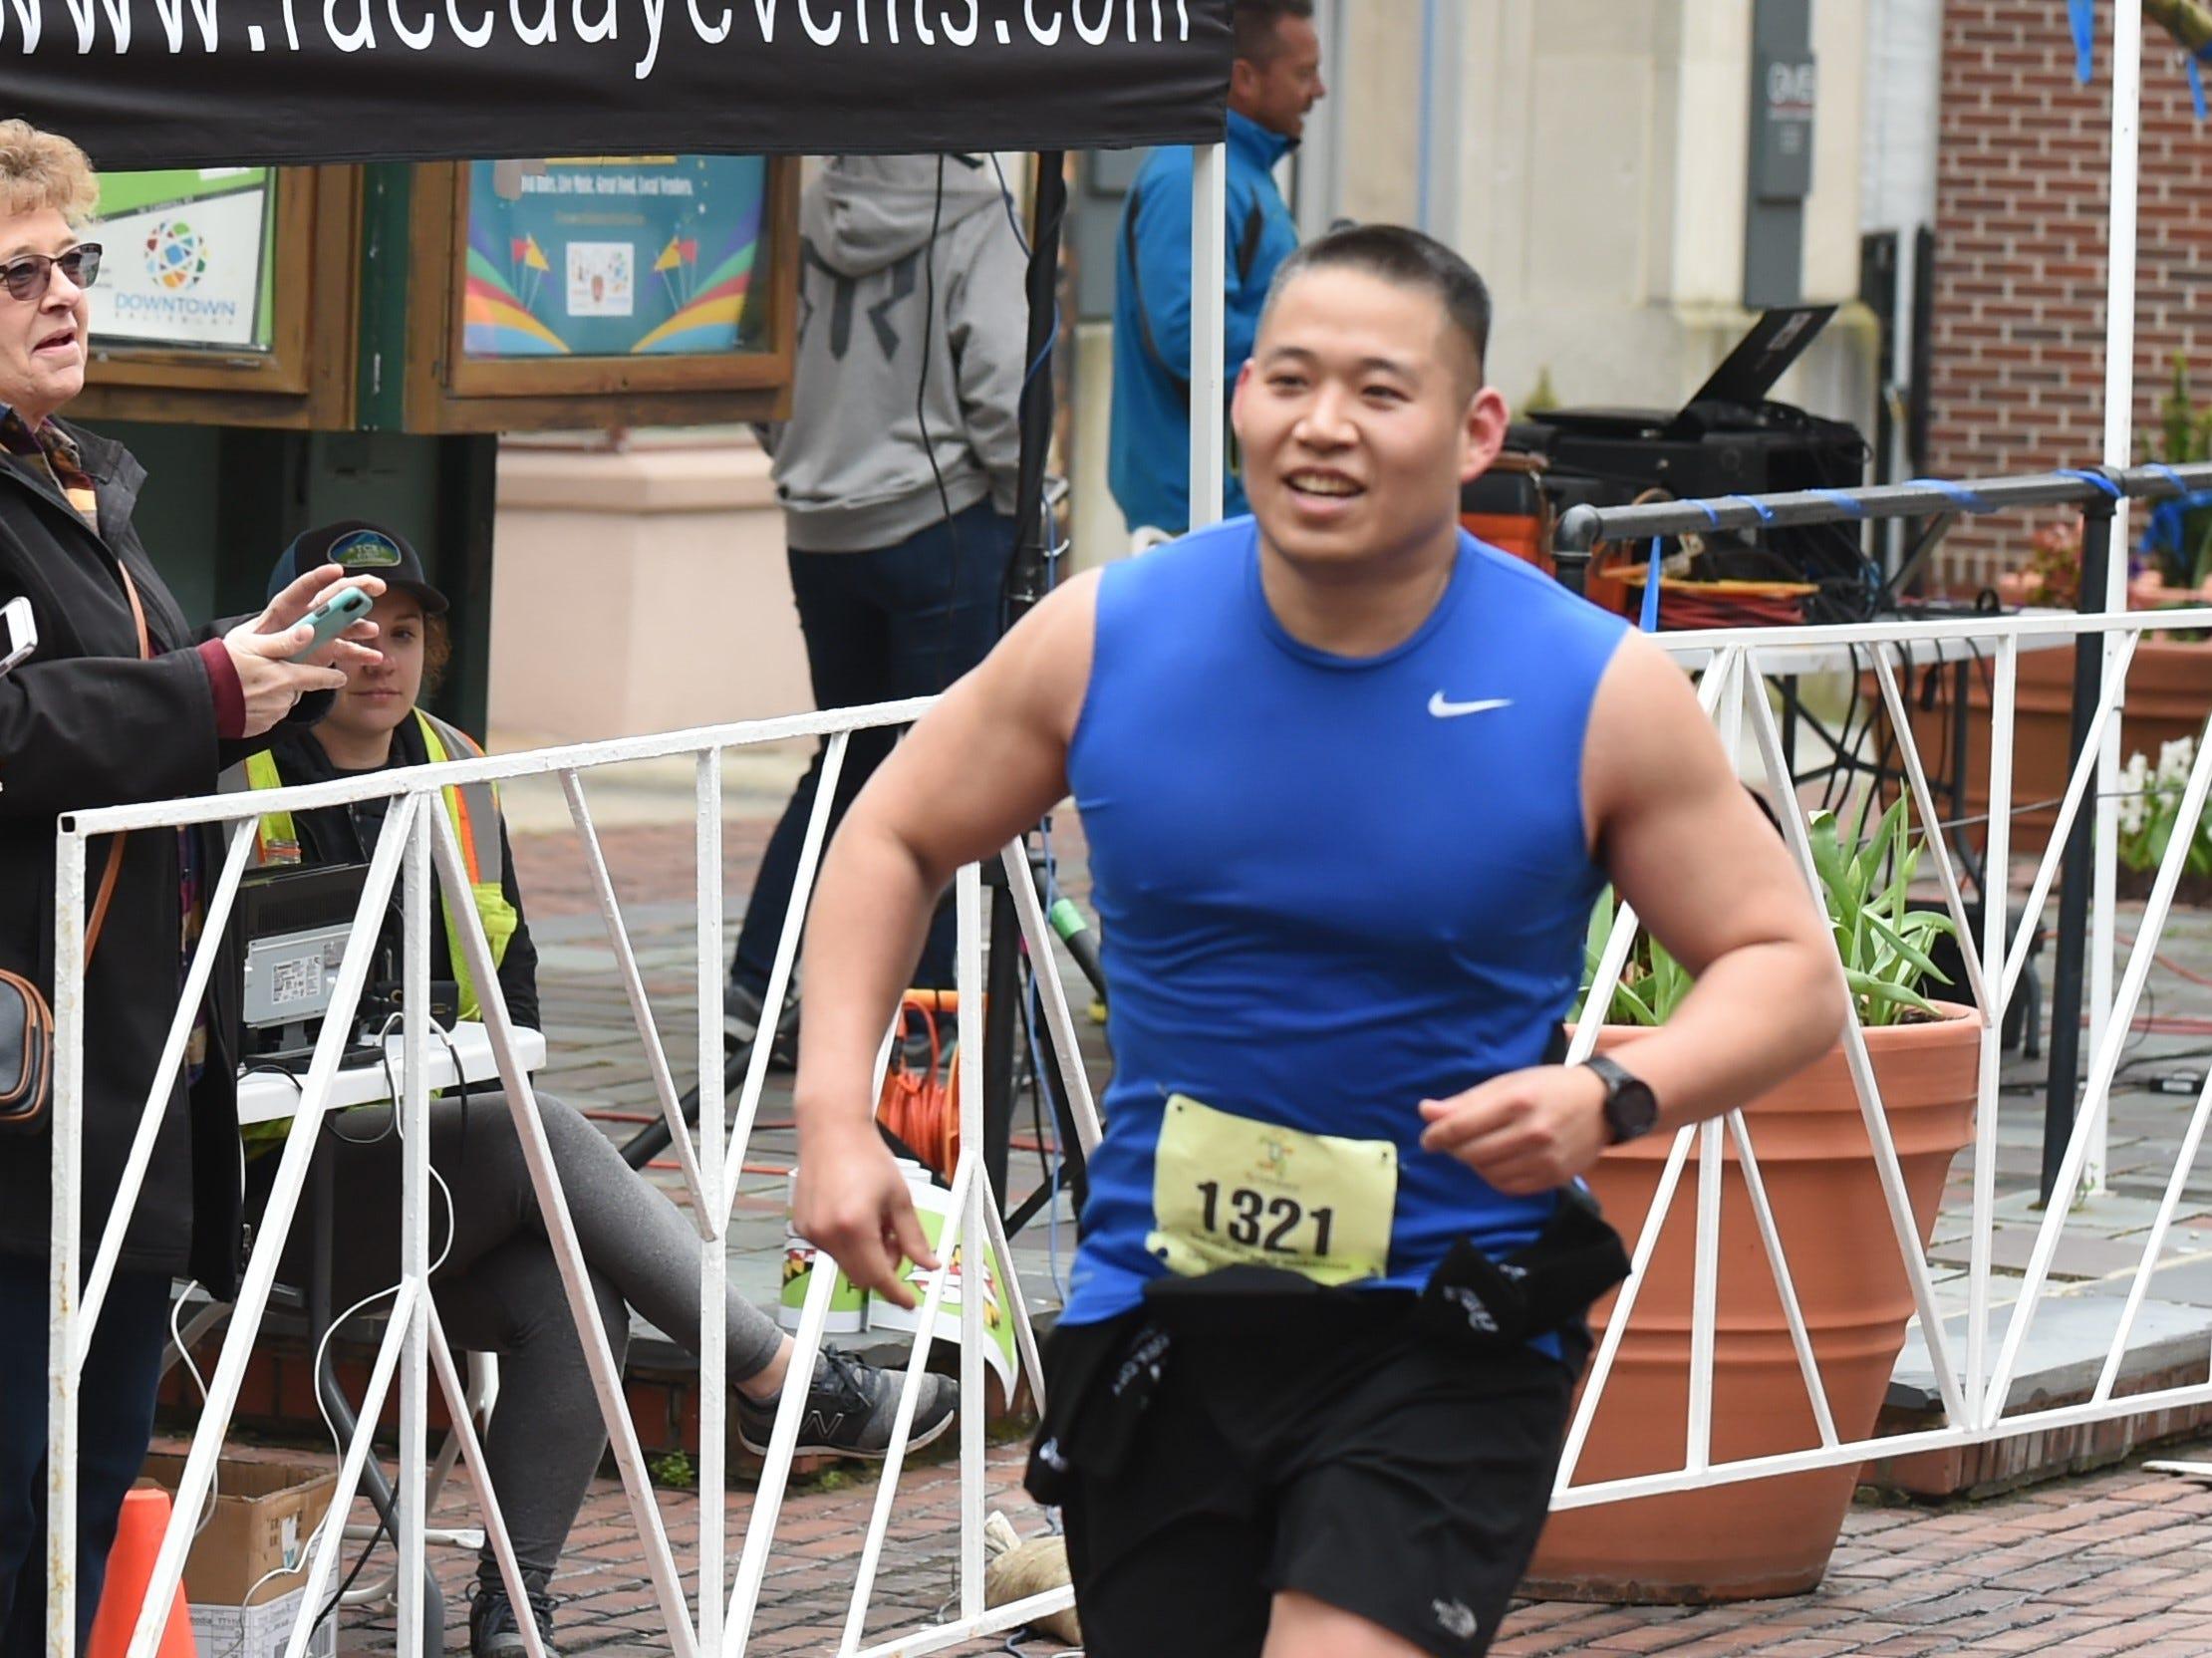 Elijah Kim eyes the finish line after running in the half marathon at the 2nd Salisbury Marathon/ Half Marathon/ 5k on Saturday, April 6, 2019.